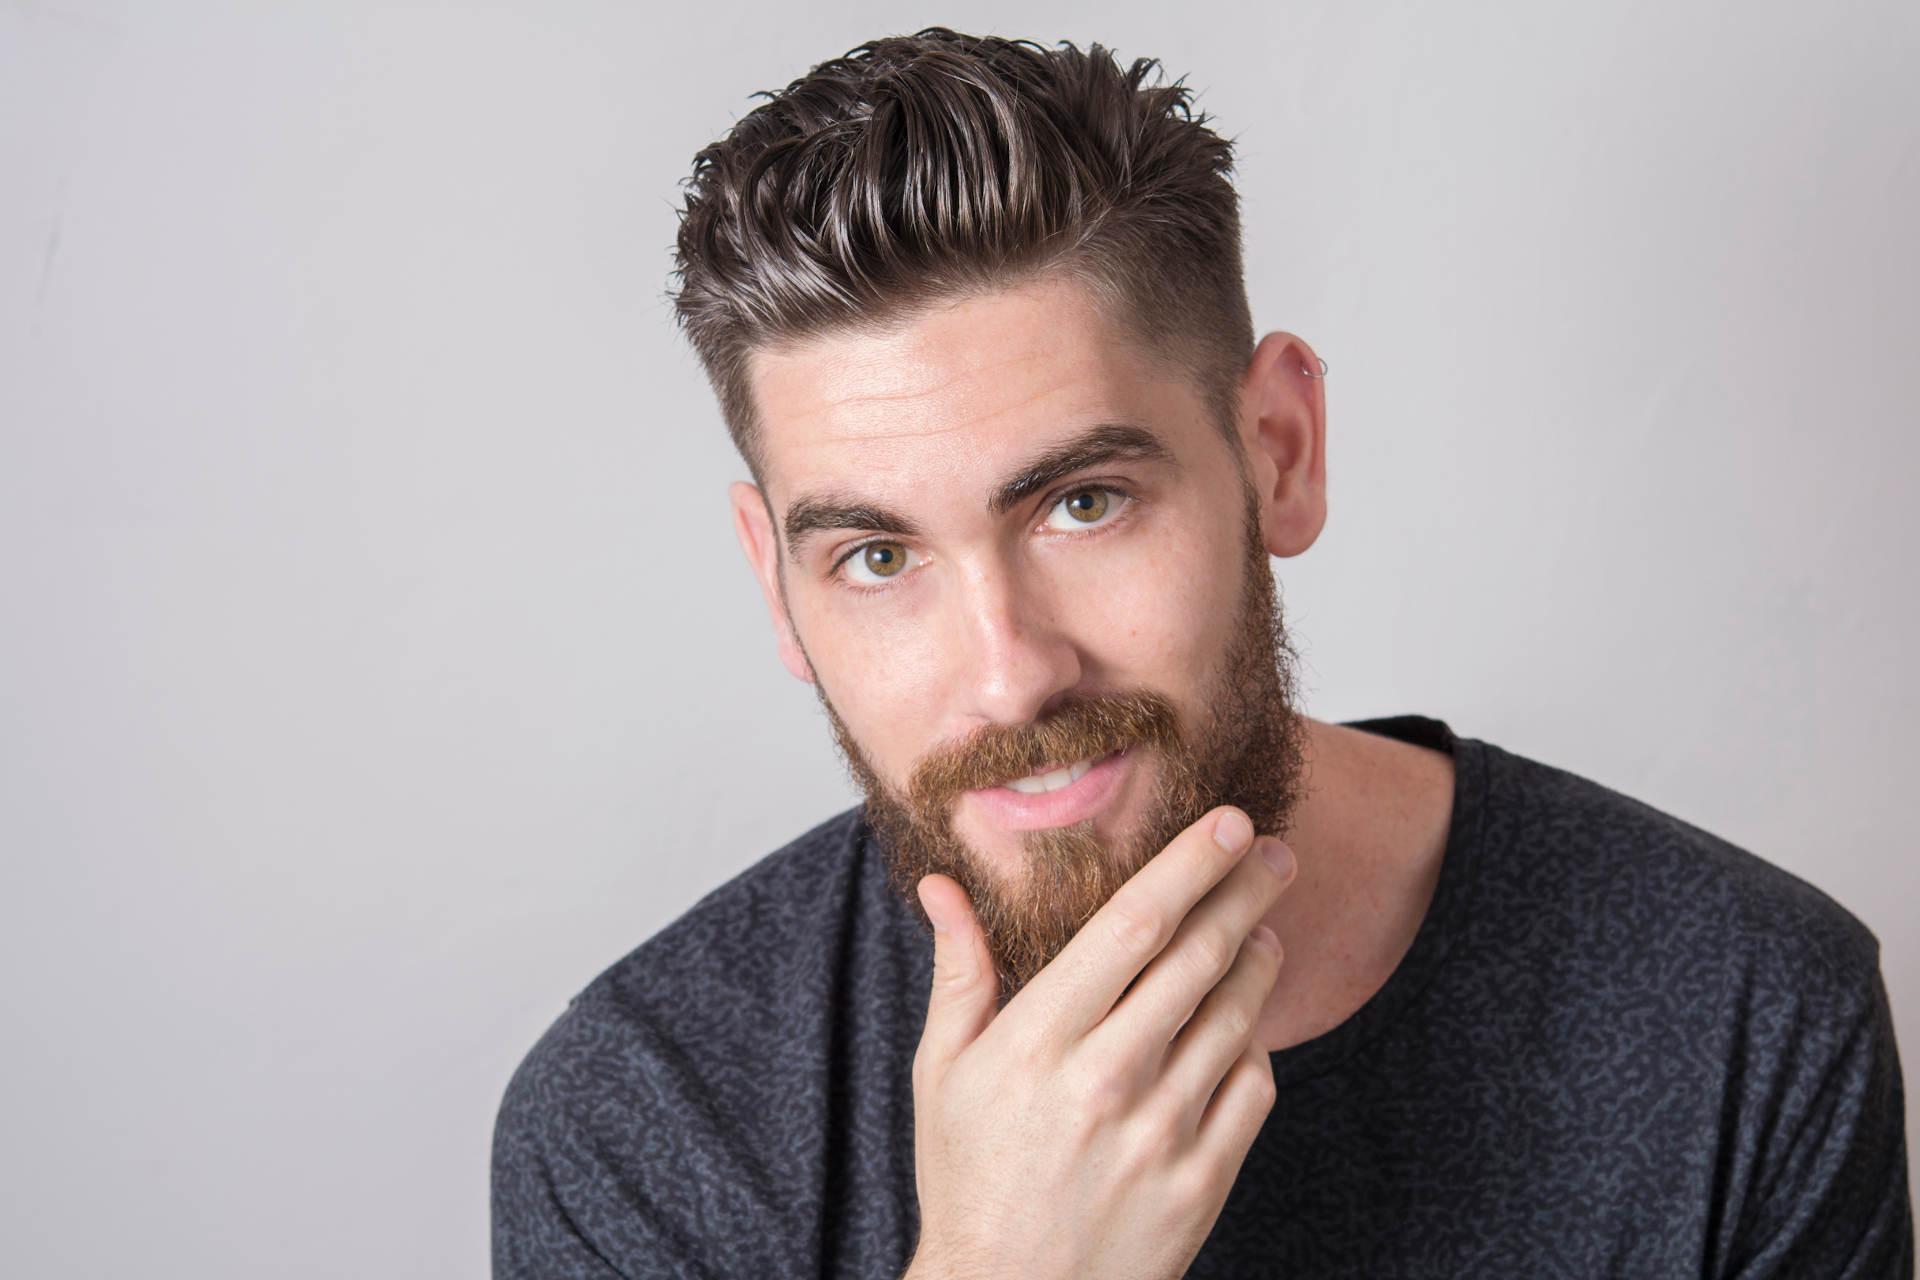 How to Grow a Beard - A Beginners Guide to Grow a Beard